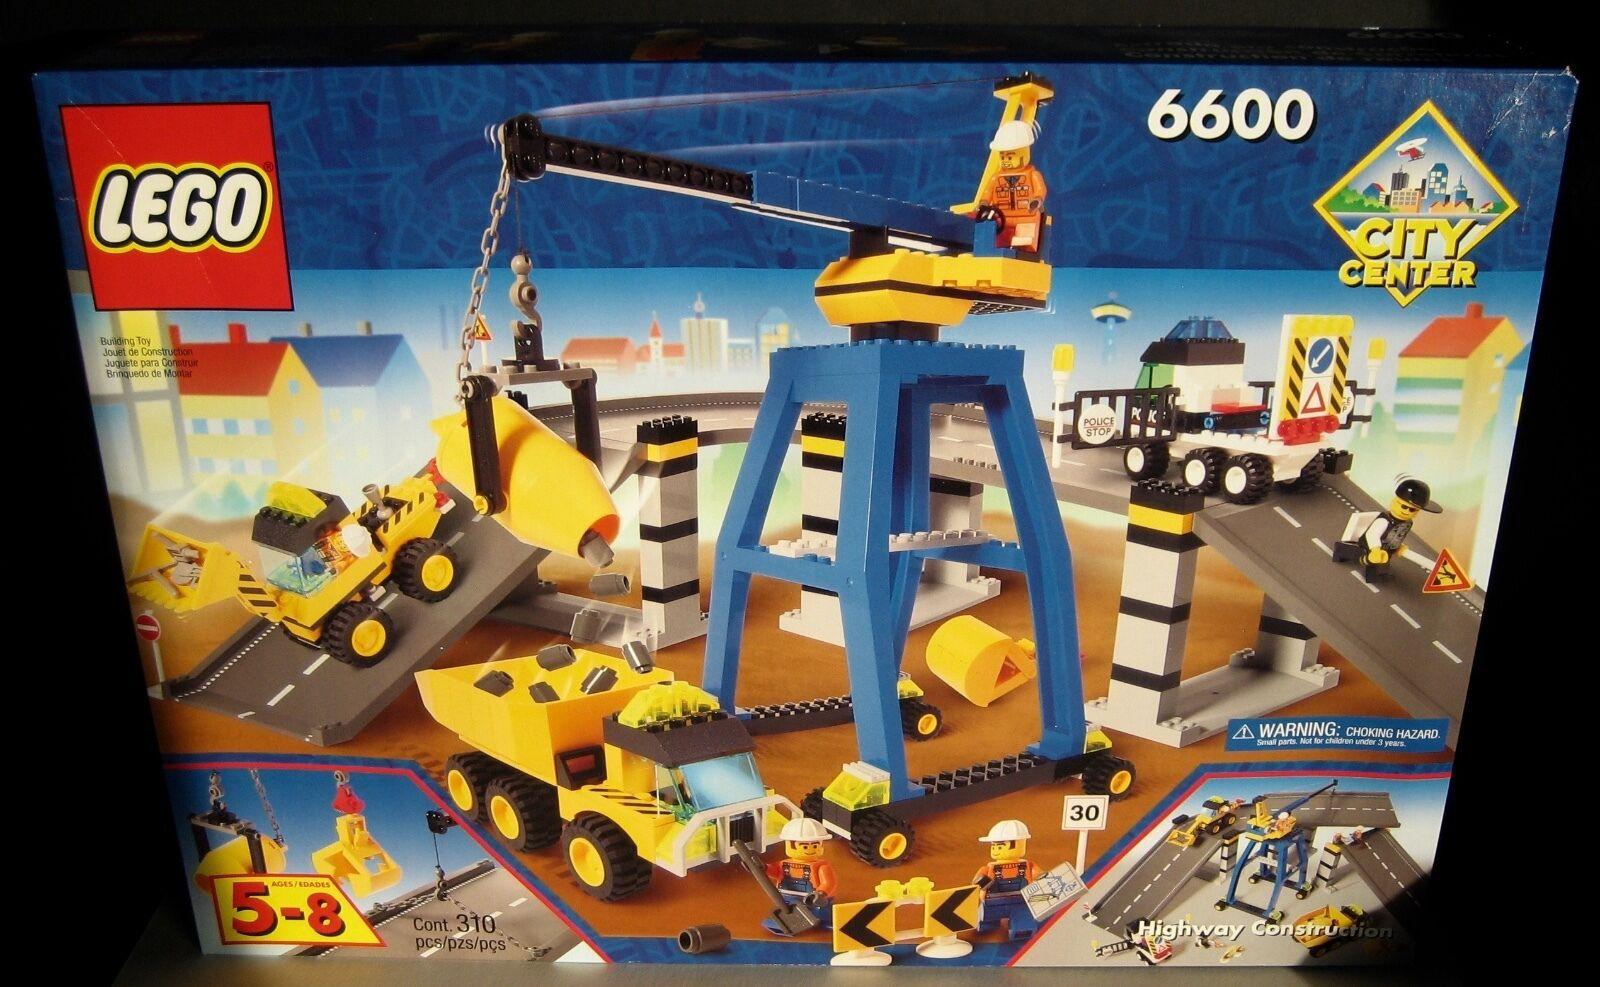 Lego City City City Center 6600 Highway Construction Kit New Factory Sealed Box + 3351 set 20d301